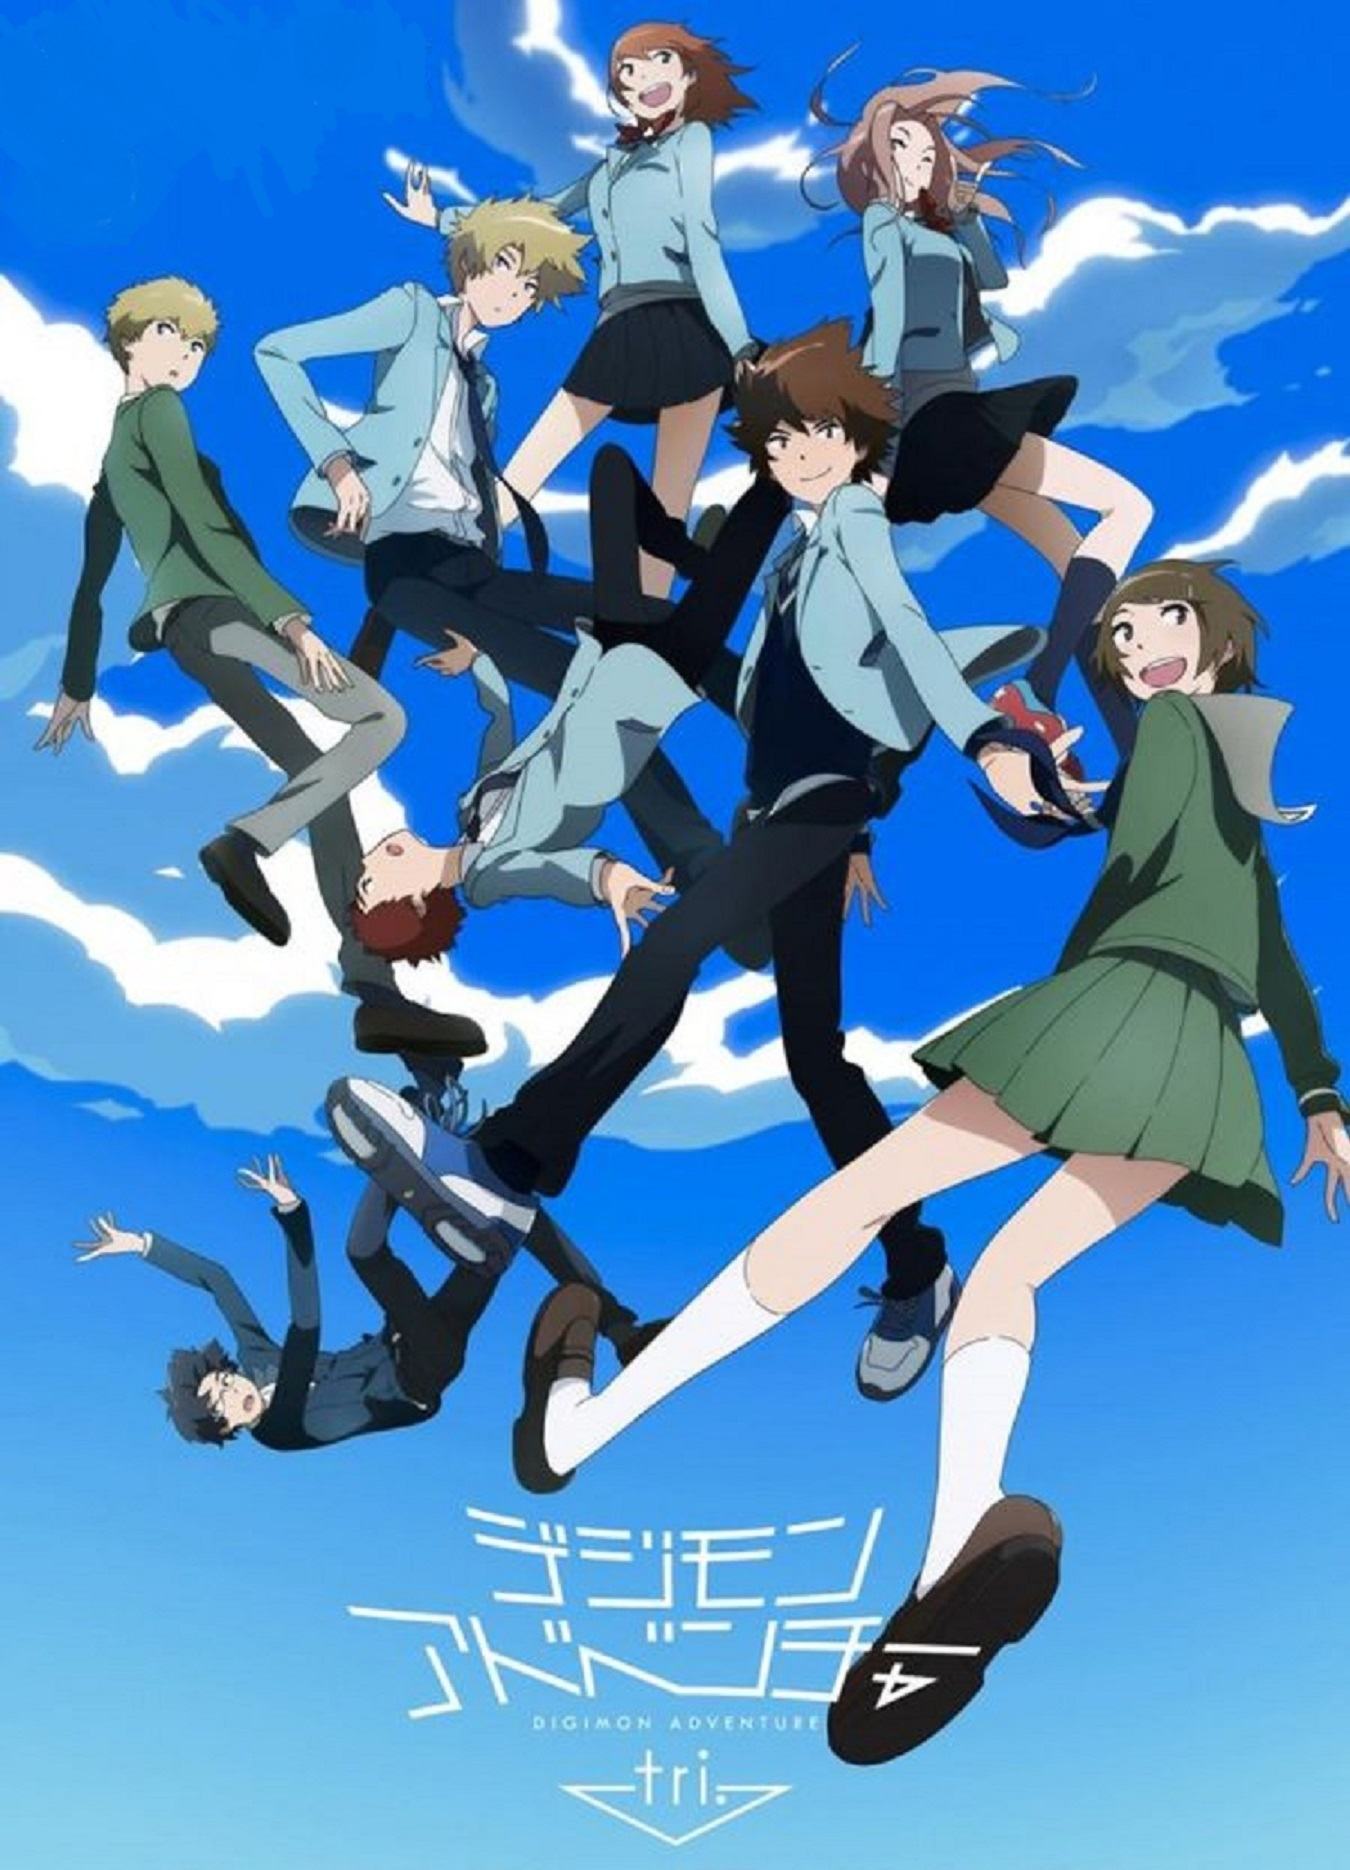 Who is daymond john dating simulators anime